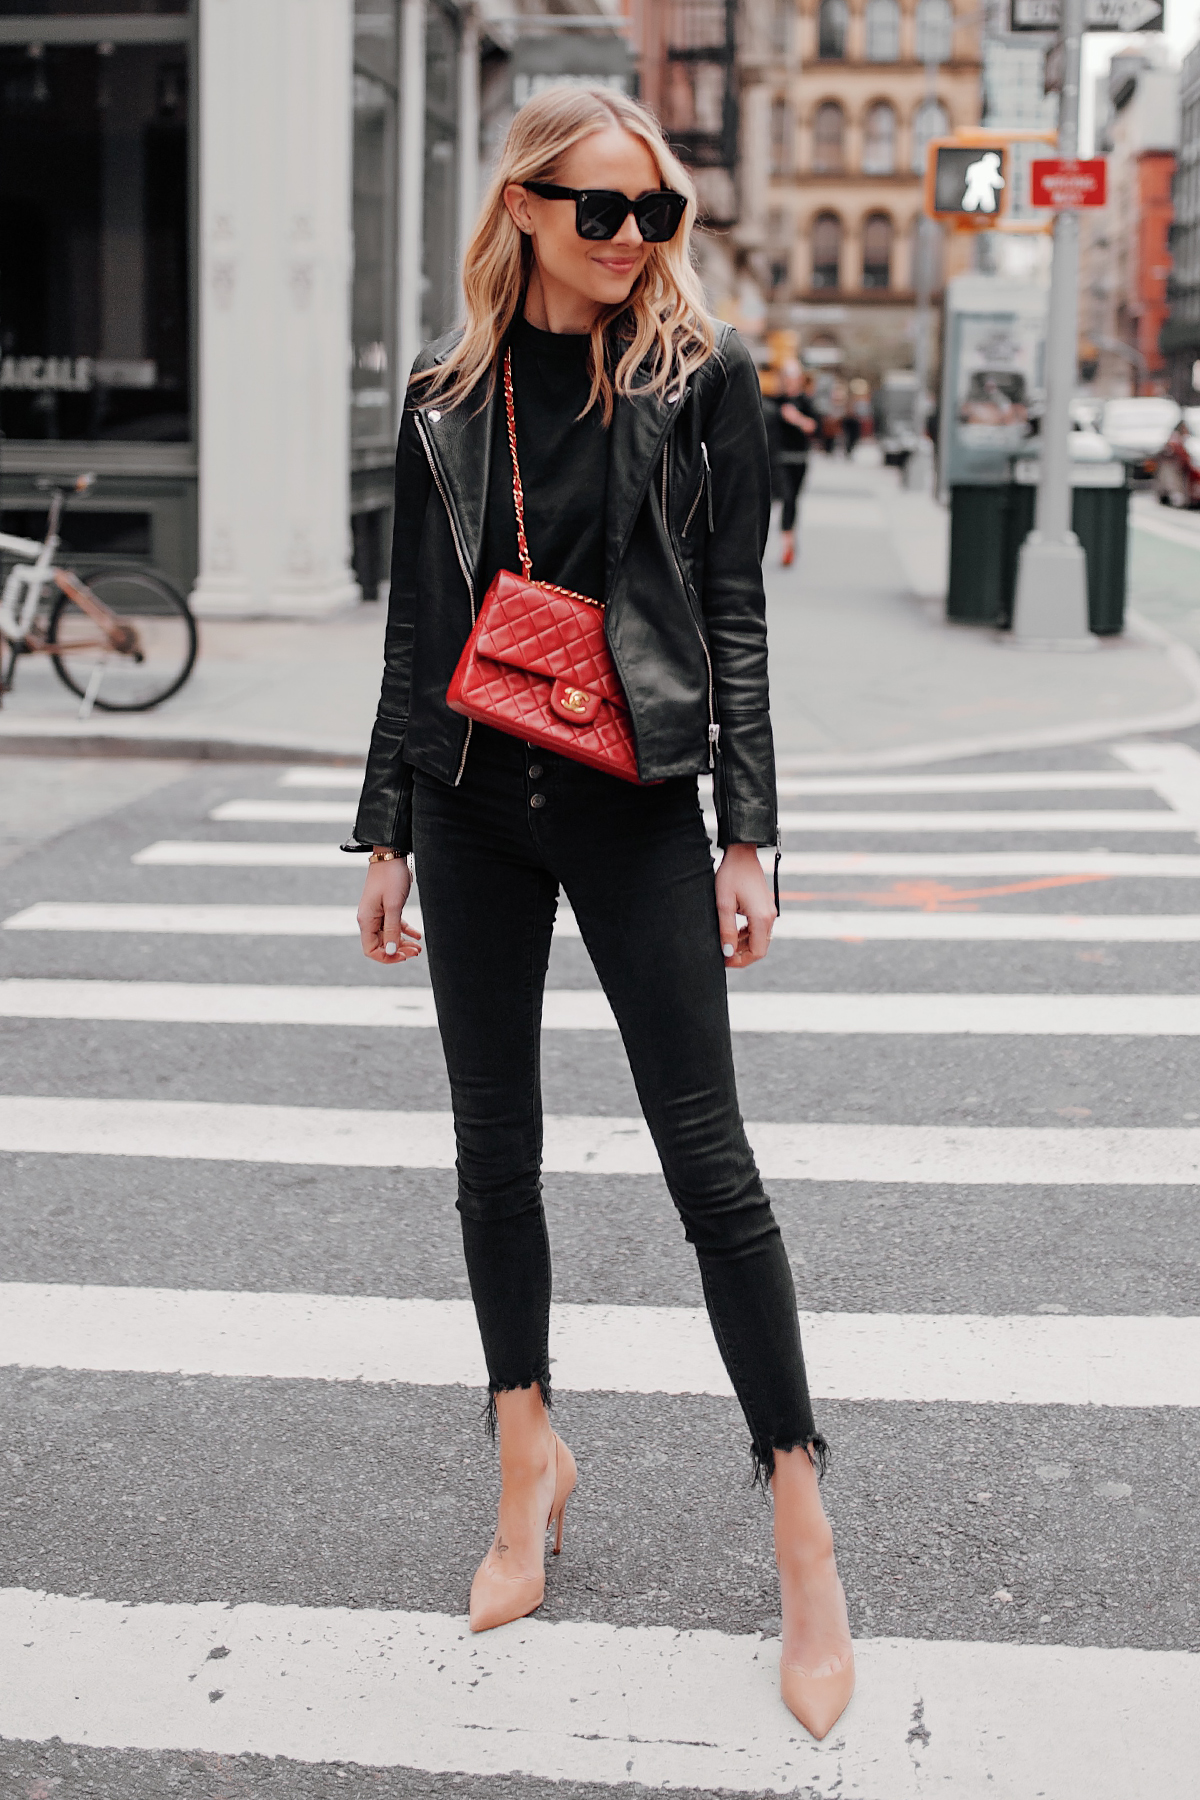 Fashion Jackson Wearing Black Leather Jacket Black Skinny Jeans Red Chanel Handbag Nude Pumps NYC Street Style